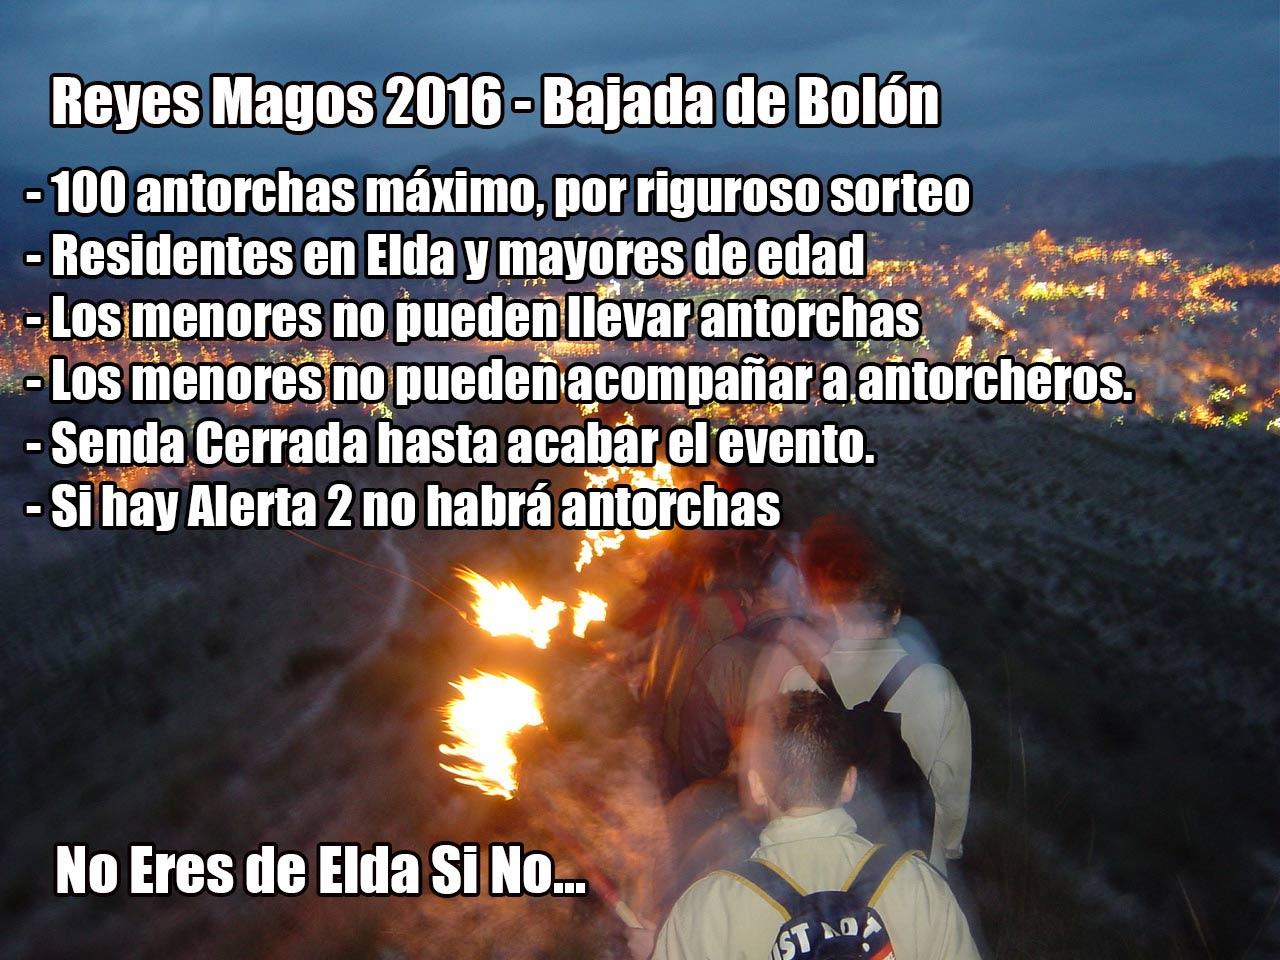 bolon reyes 2016 normativa